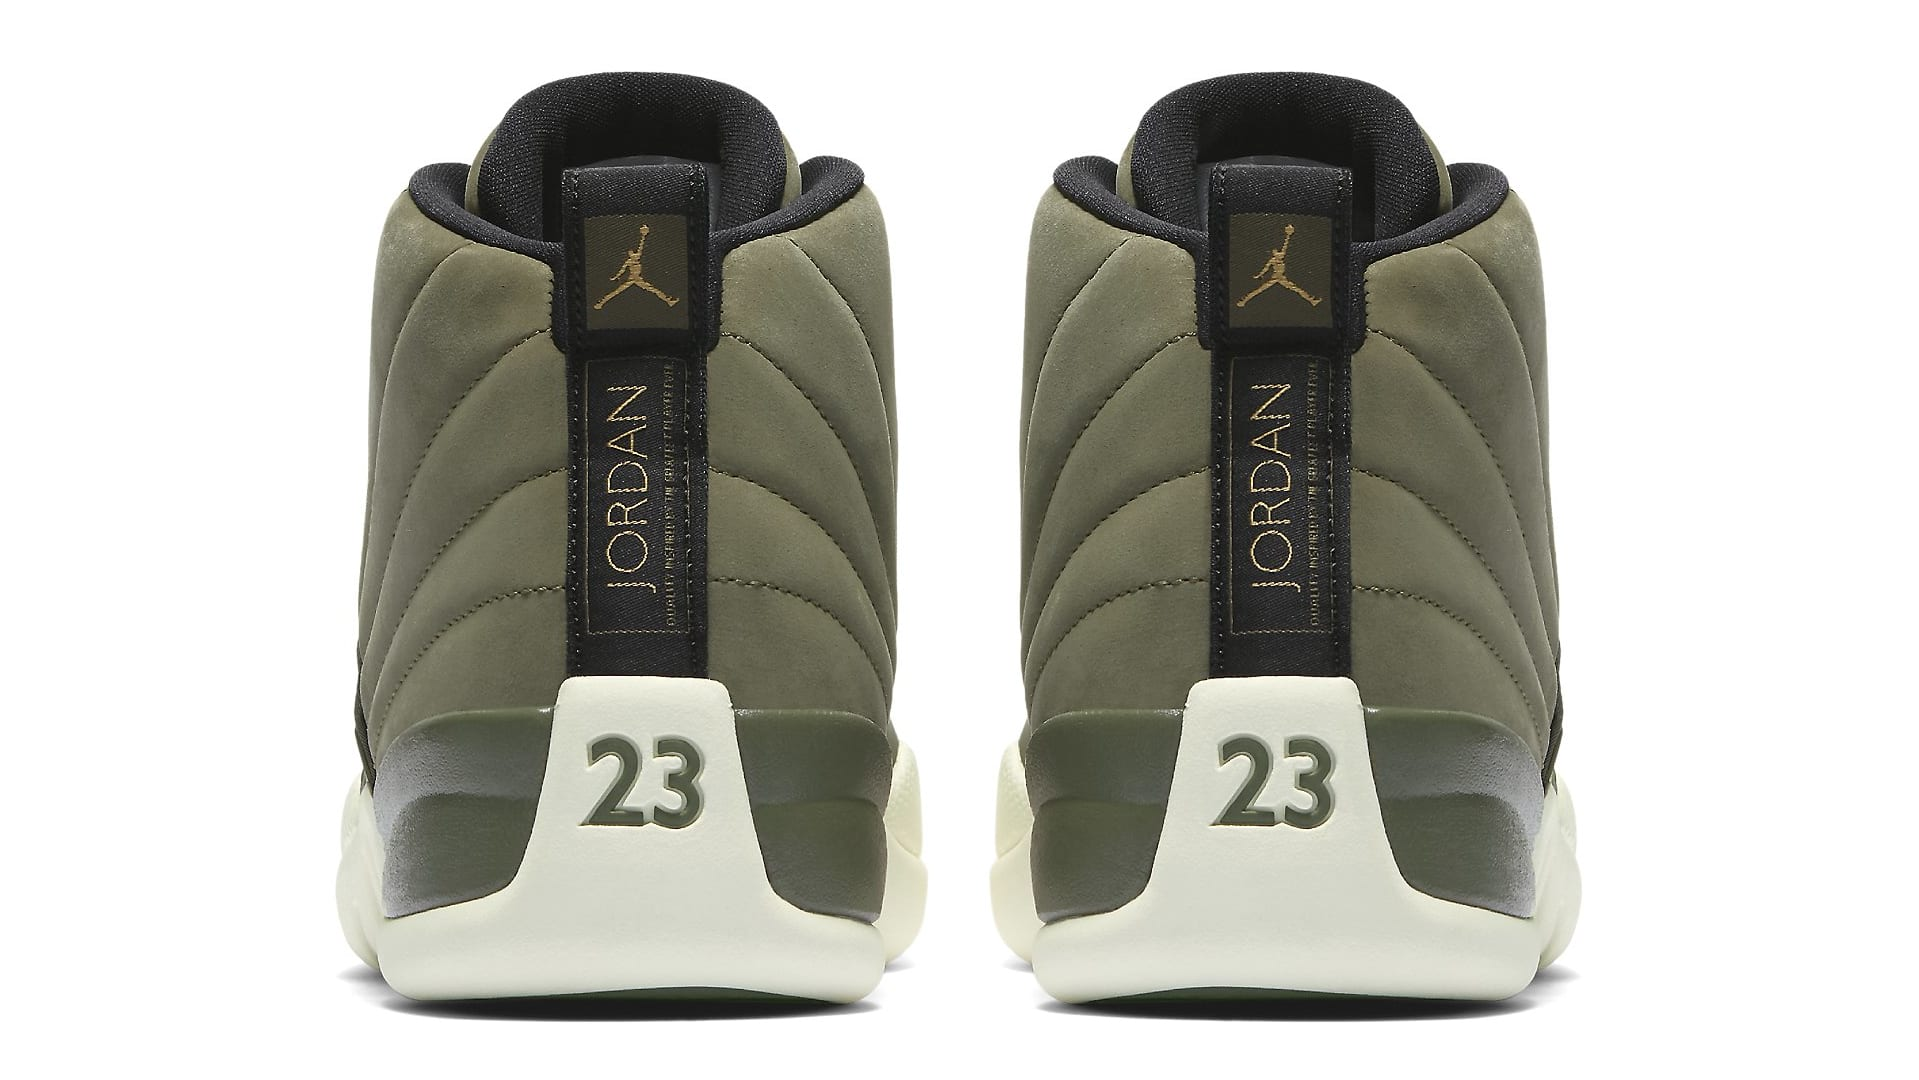 45fef53d4e25 ... 2003 Release Date 130690-301  Image via Nike air-jordan-12-chris-paul- class-of ...